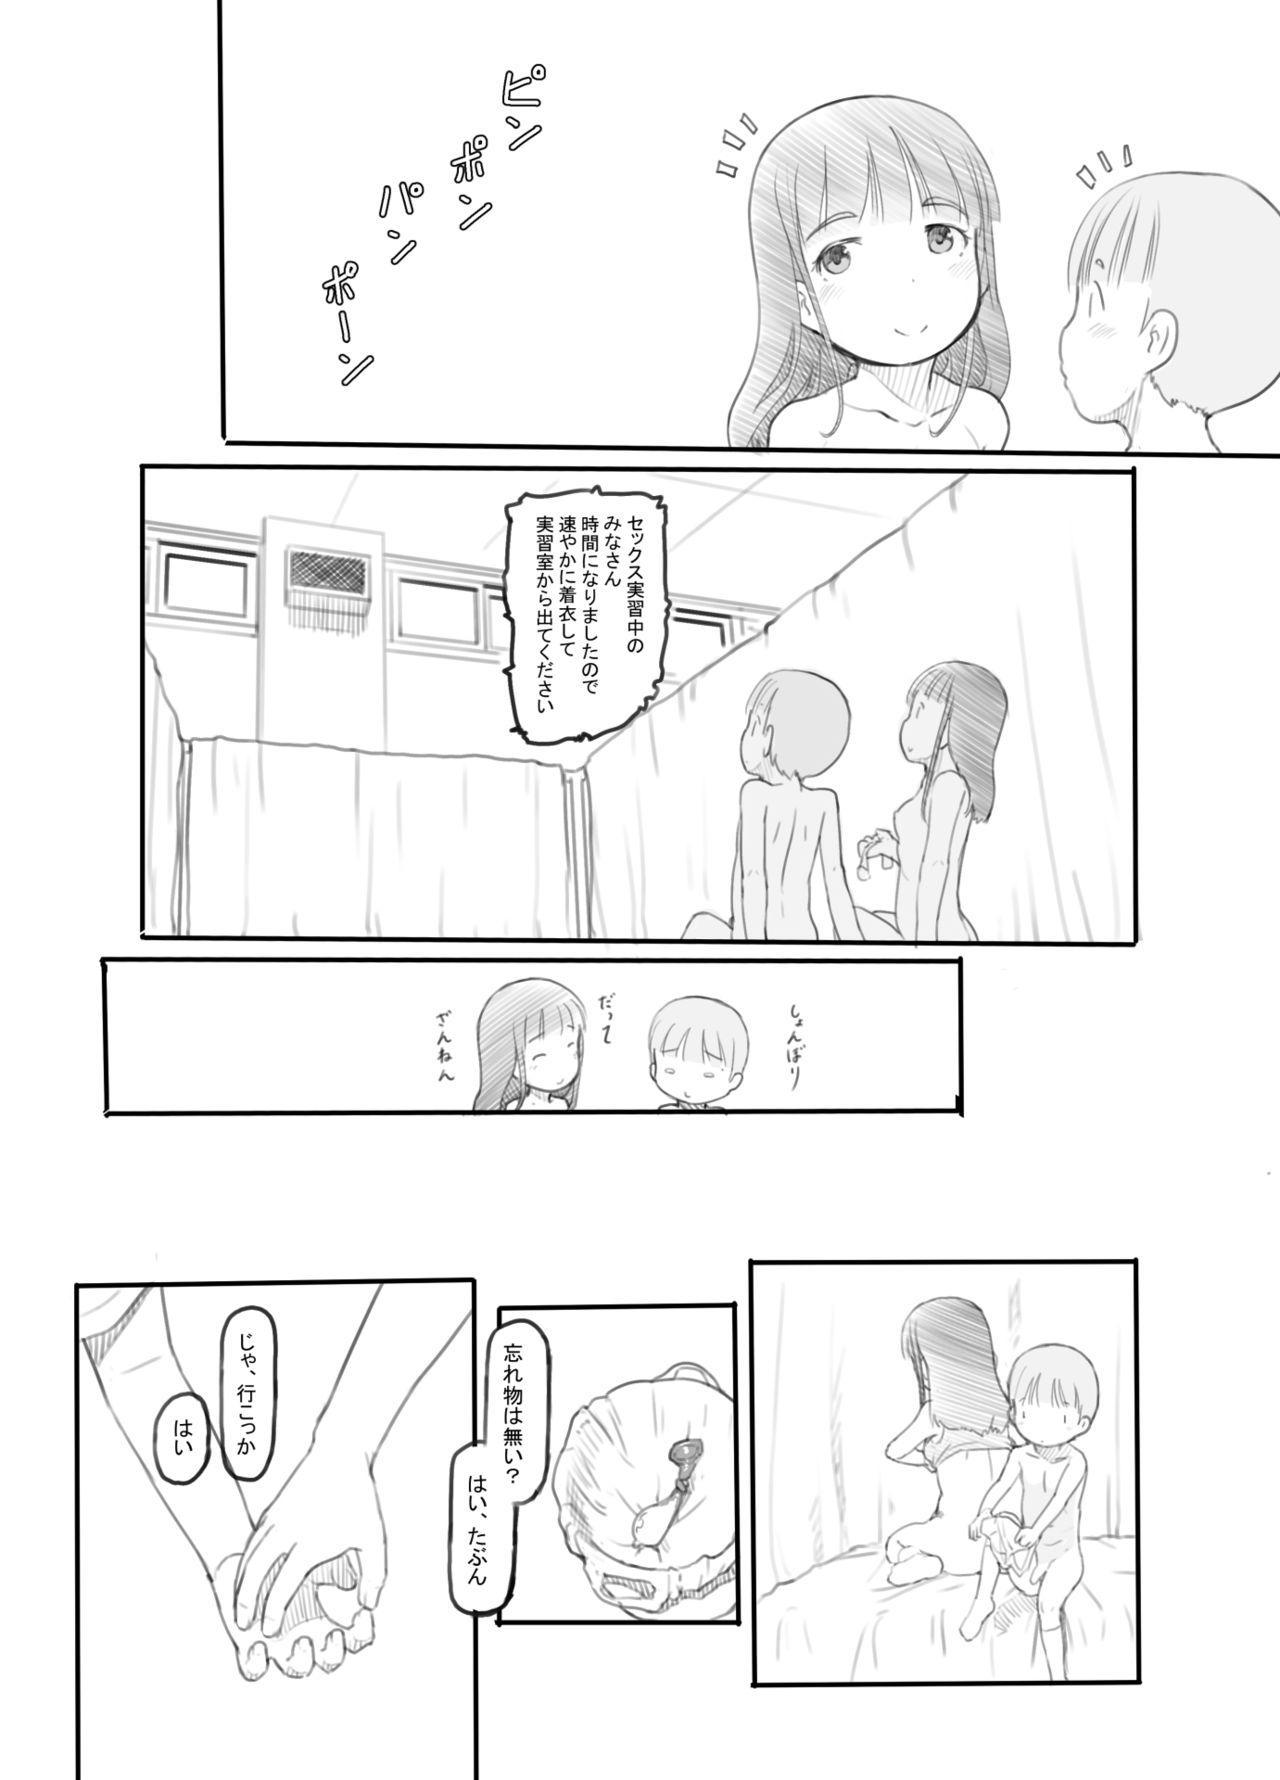 OneShota Sex Jisshuu 28